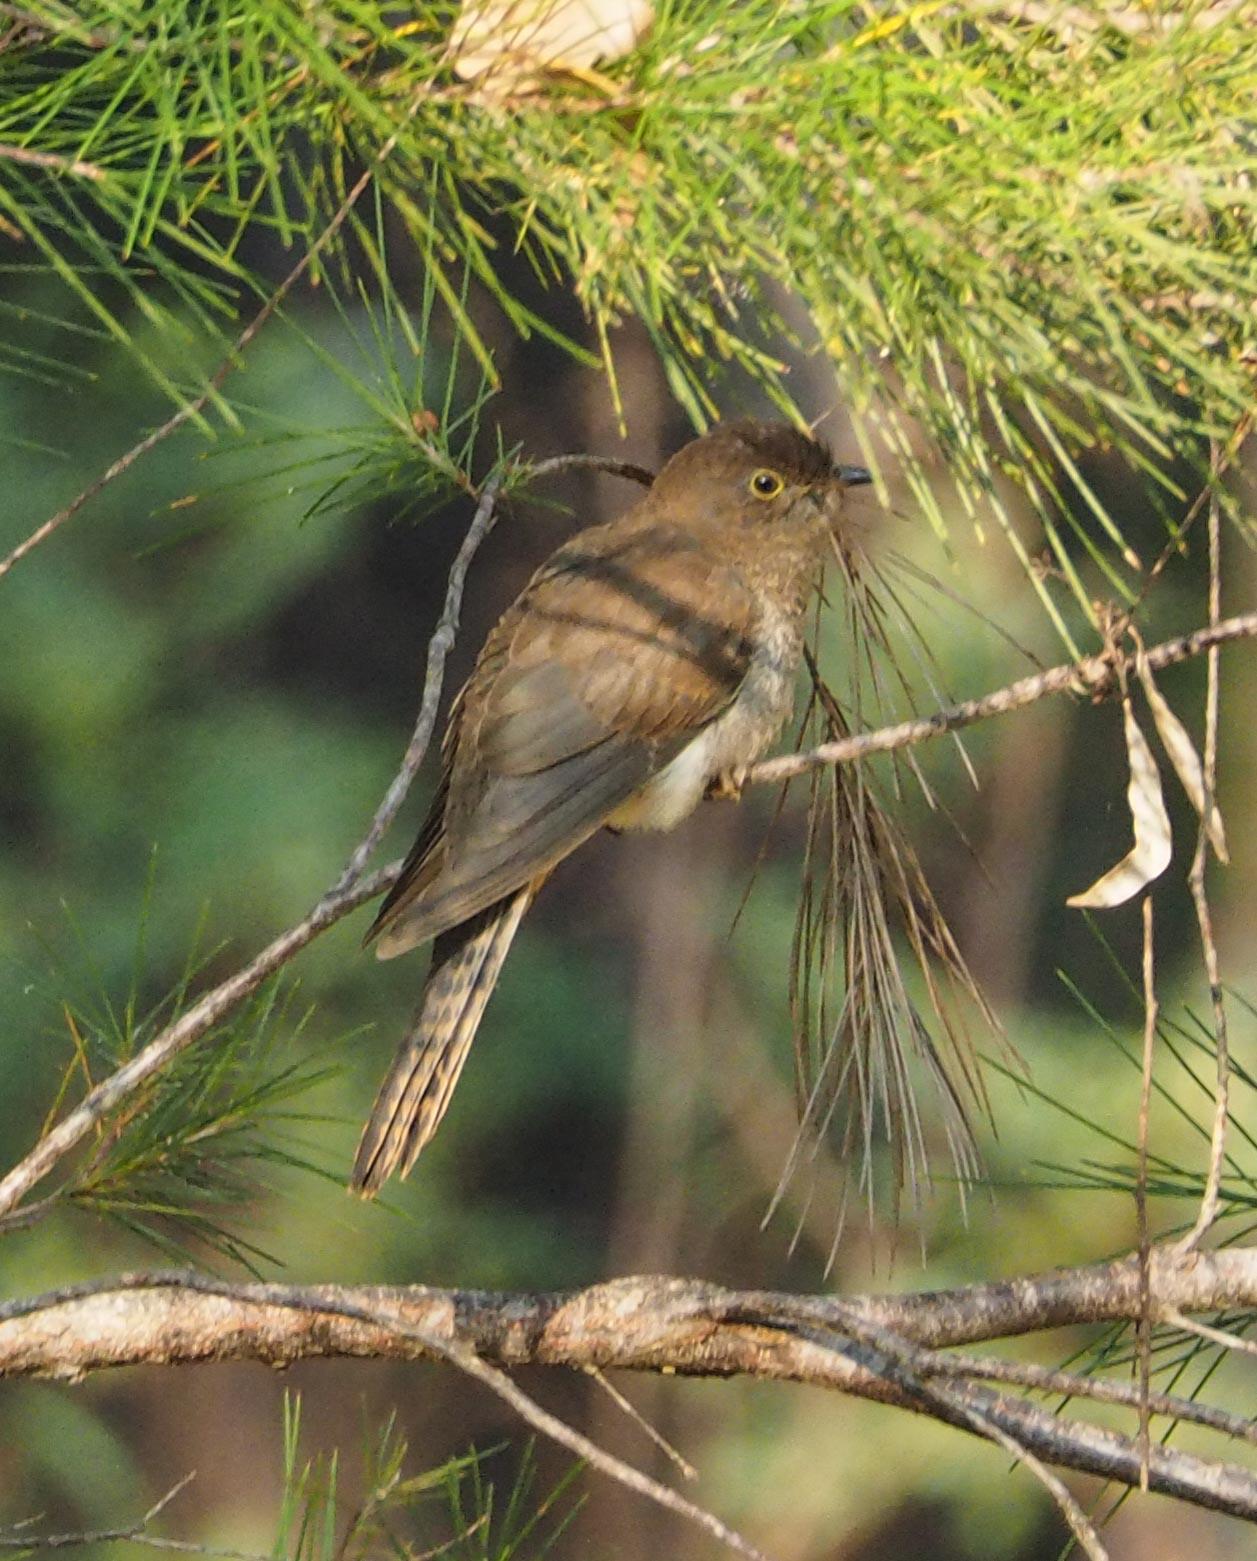 Fan-tailed Cuckoo (juvenile)